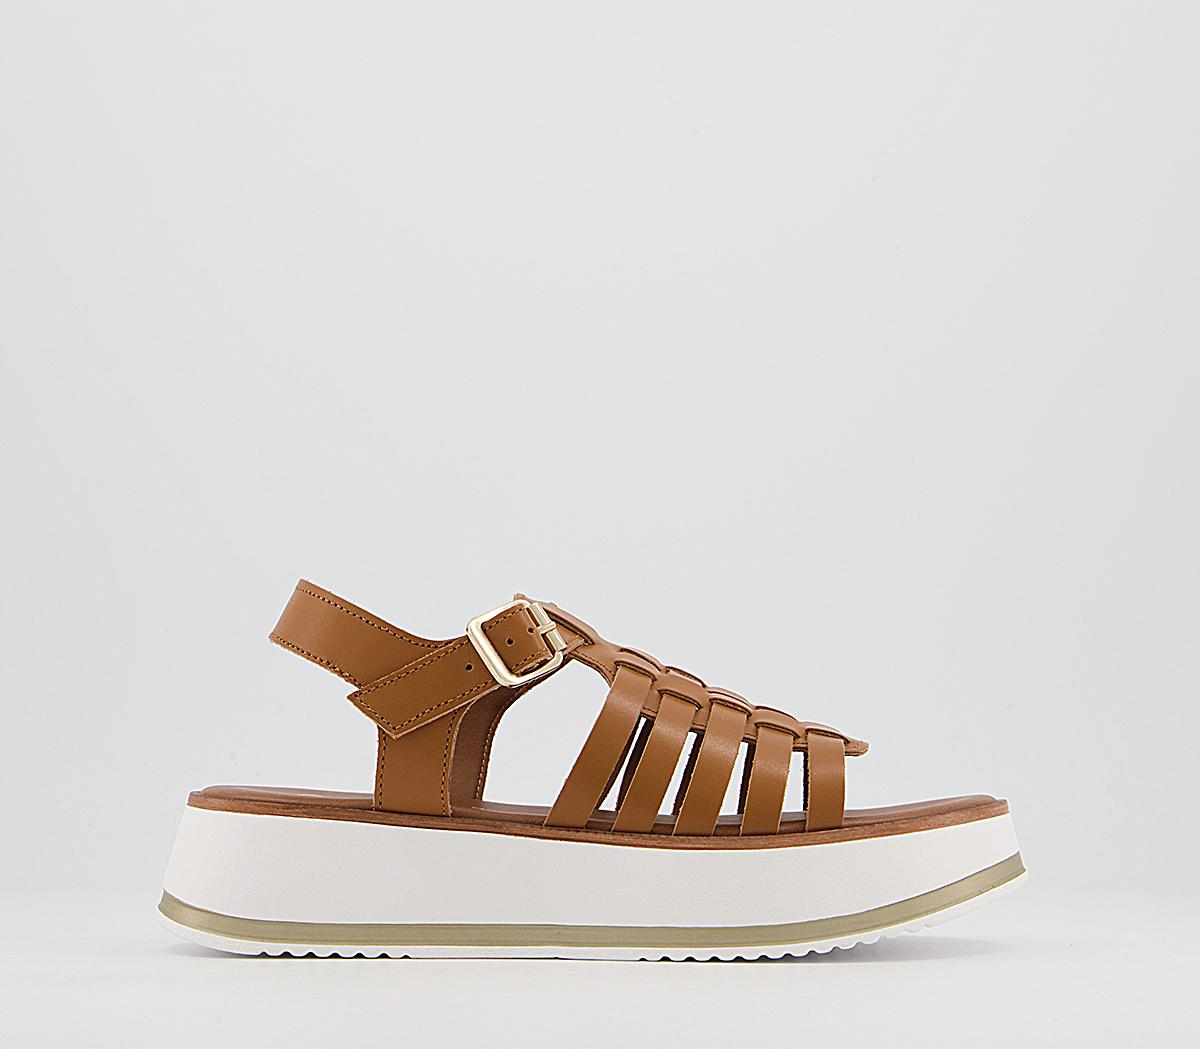 Menorca Geek Sandals